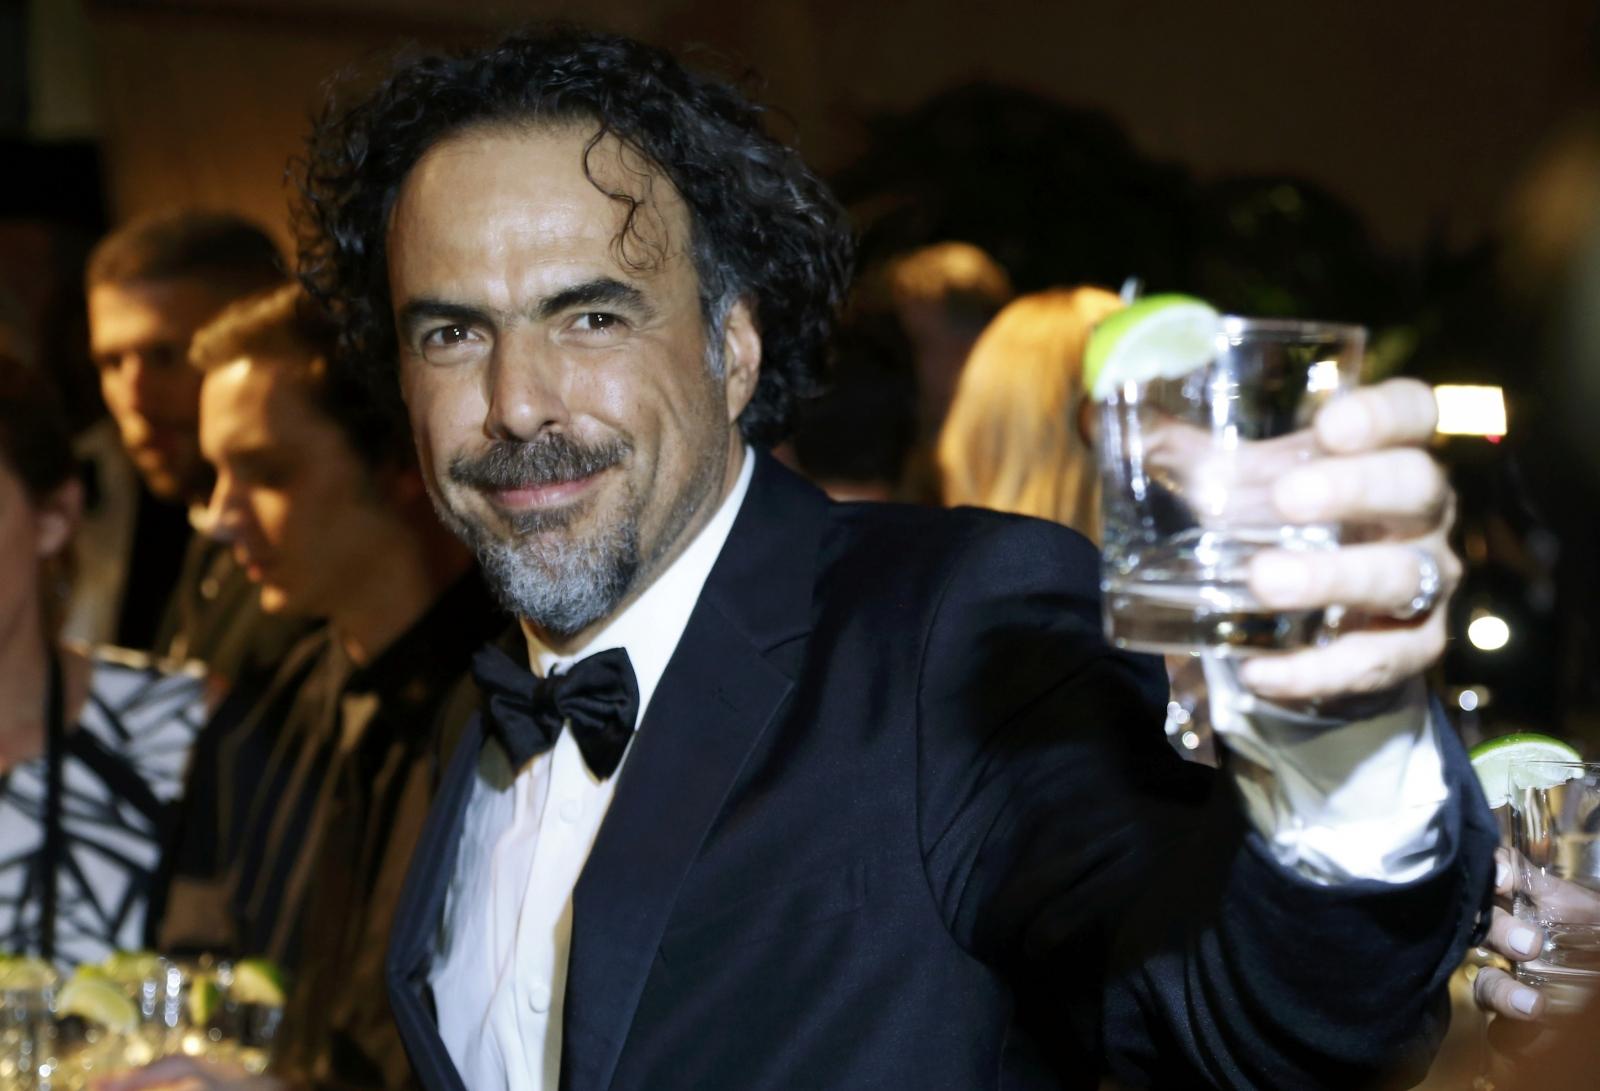 Oscars 2015: Alejandro González Iñárritu compares making Birdman to 'making love'